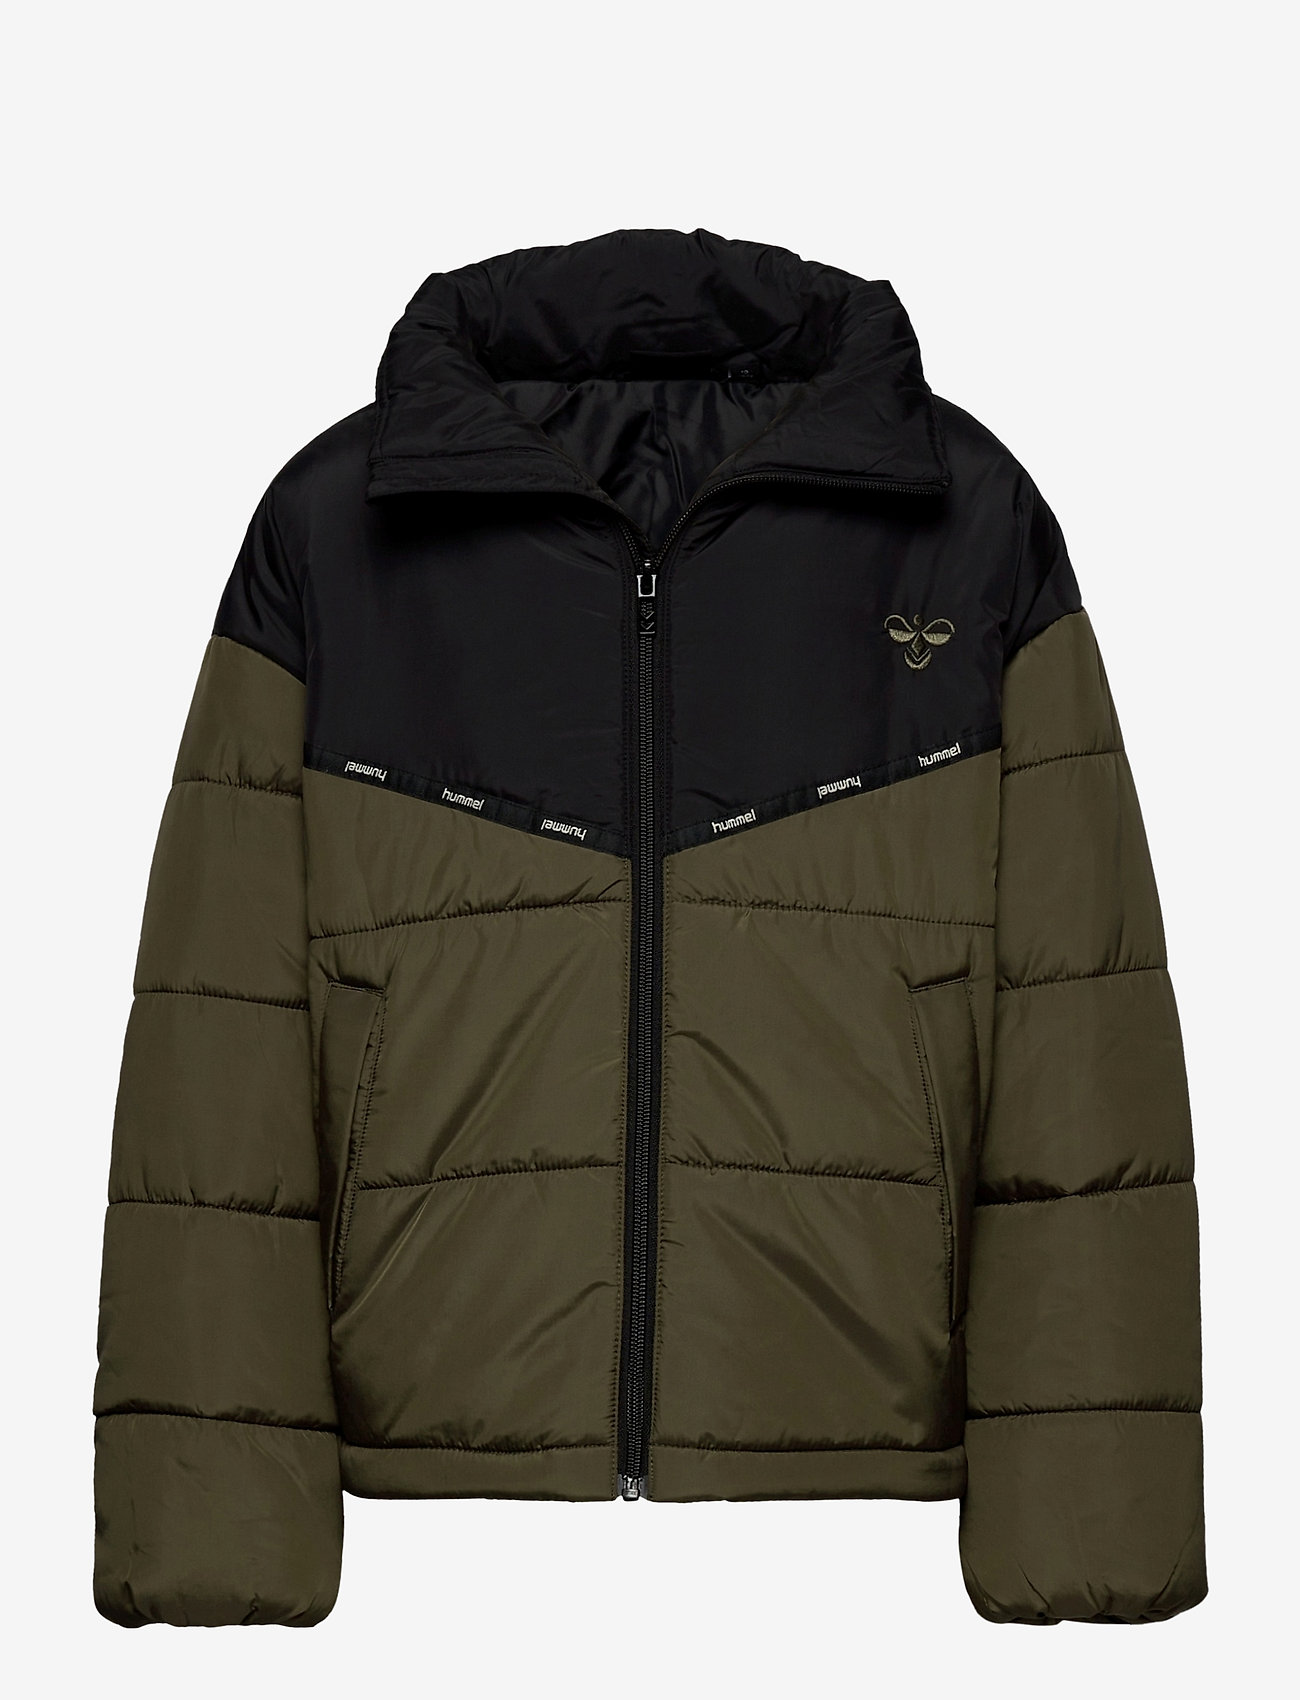 Hummel - hmlVIBRANT JACKET - insulated jackets - olive night - 0